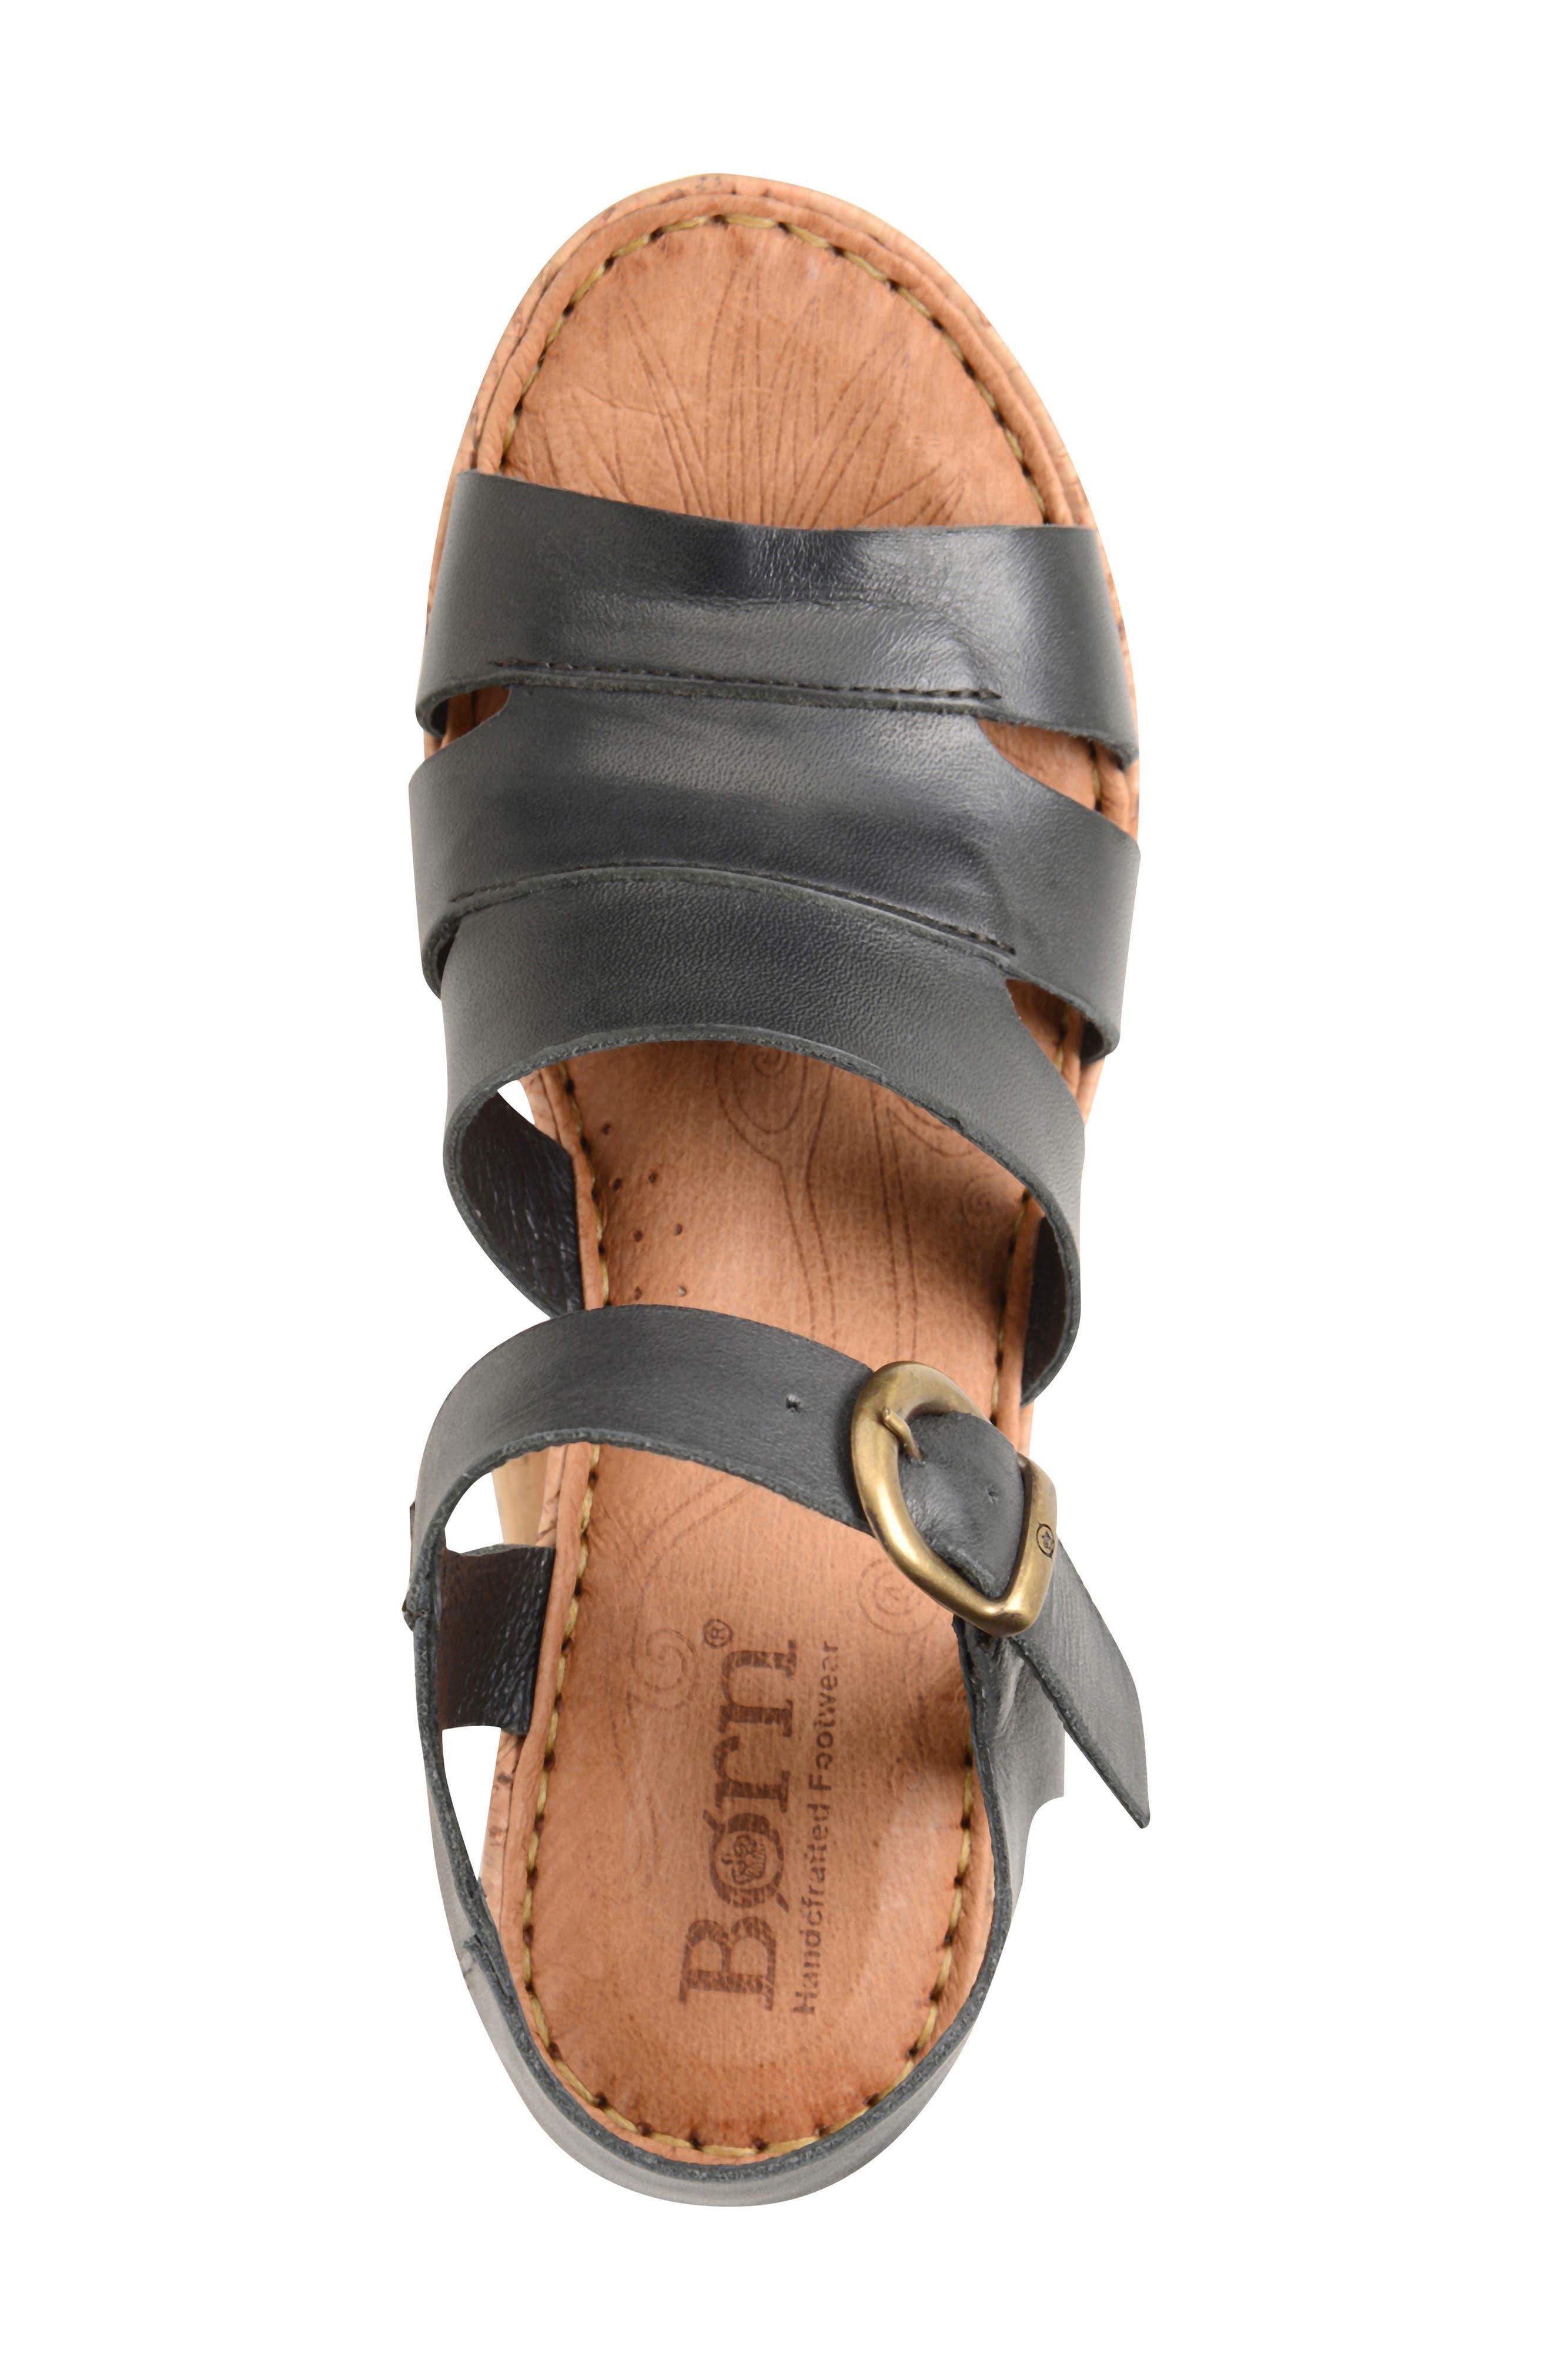 Anori Platform Wedge Sandal,                             Alternate thumbnail 3, color,                             001